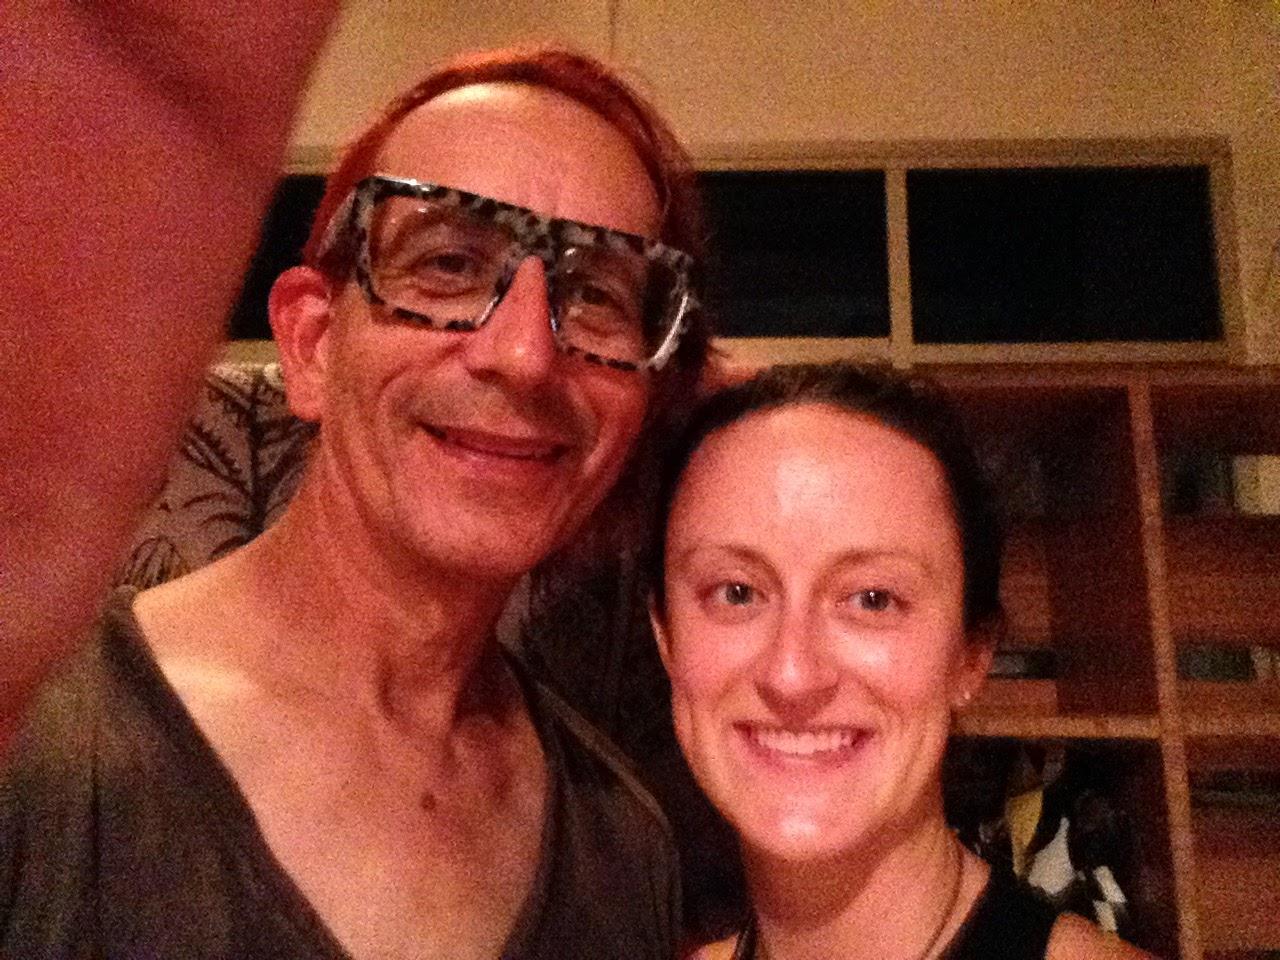 selfie of Glenn Zucman & Marielle Ebersol in a yoga studio in Venice, CA